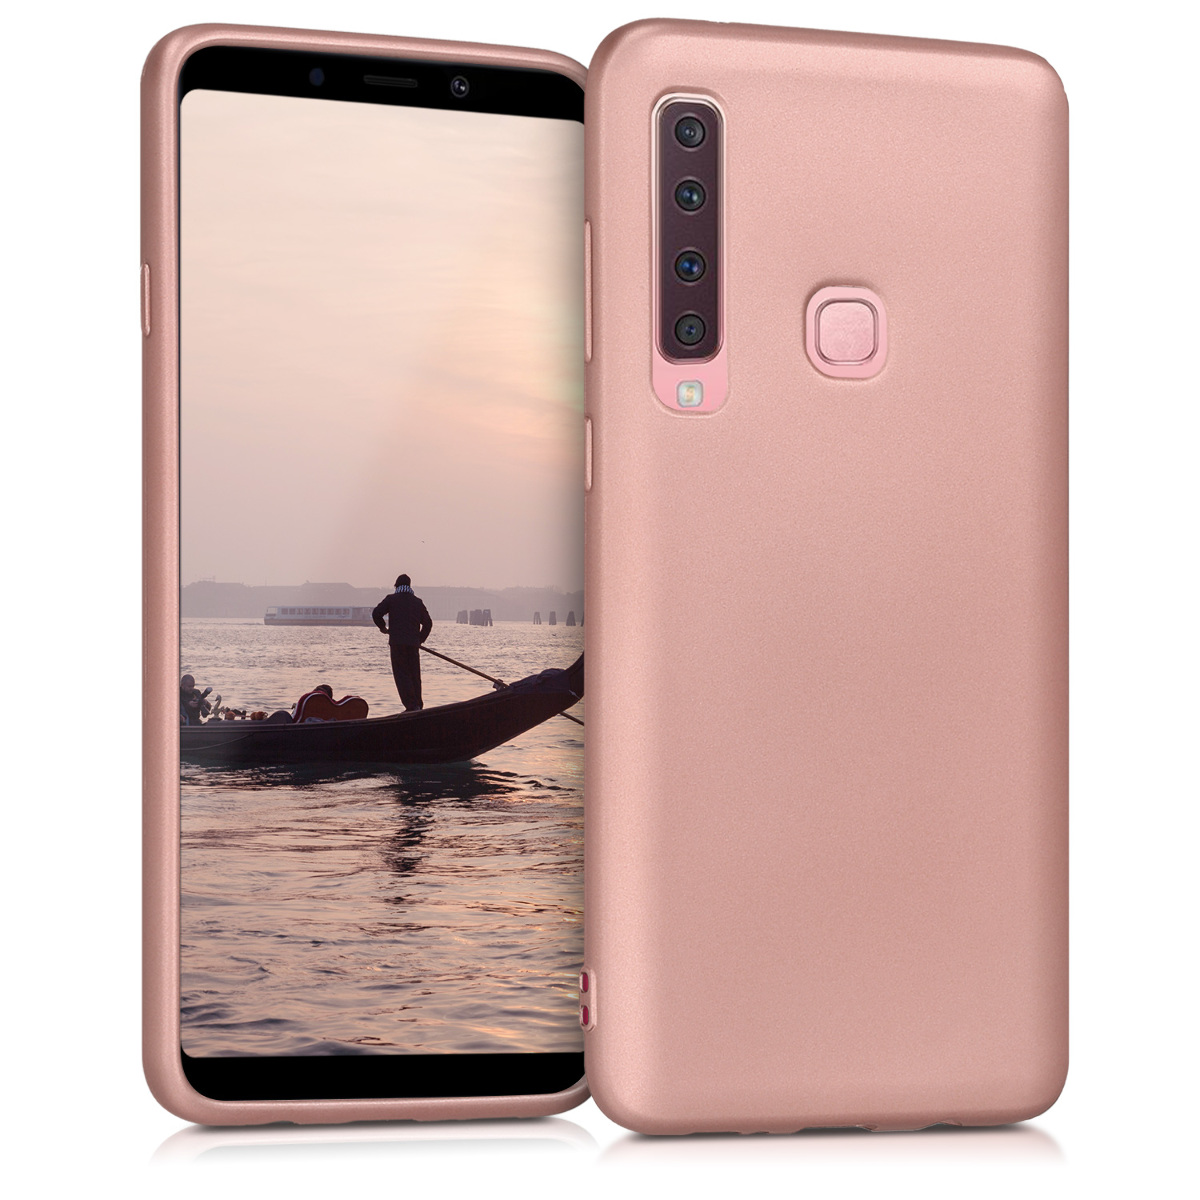 KW Θήκη Σιλικόνης (TPU) Samsung Galaxy A9 (2018) - Metallic Rose Gold (46584.31)